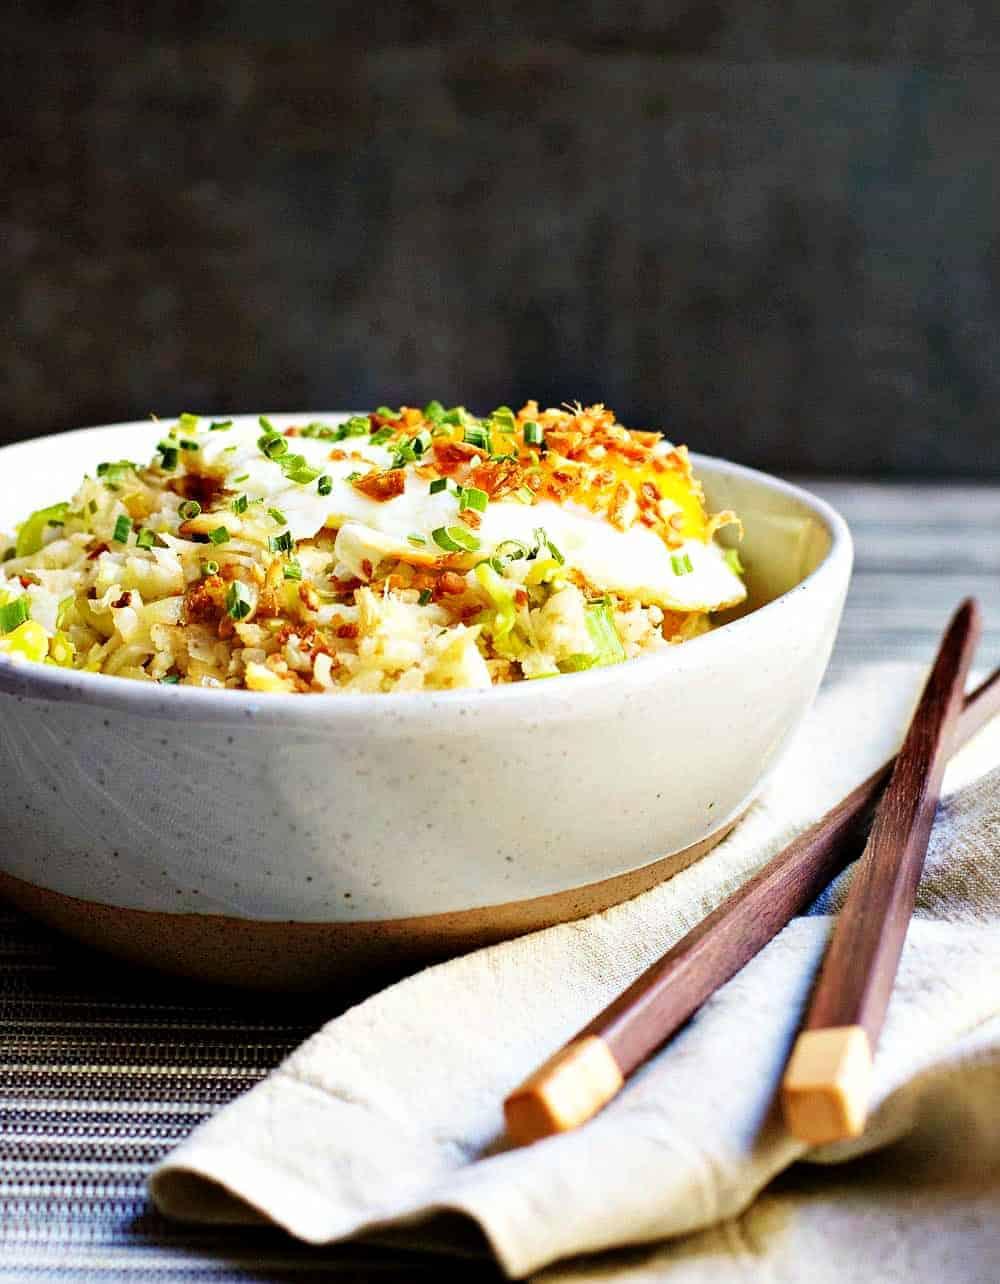 Cauliflower Fried Rice in ceramic bowl with Chopsticks and Napkin